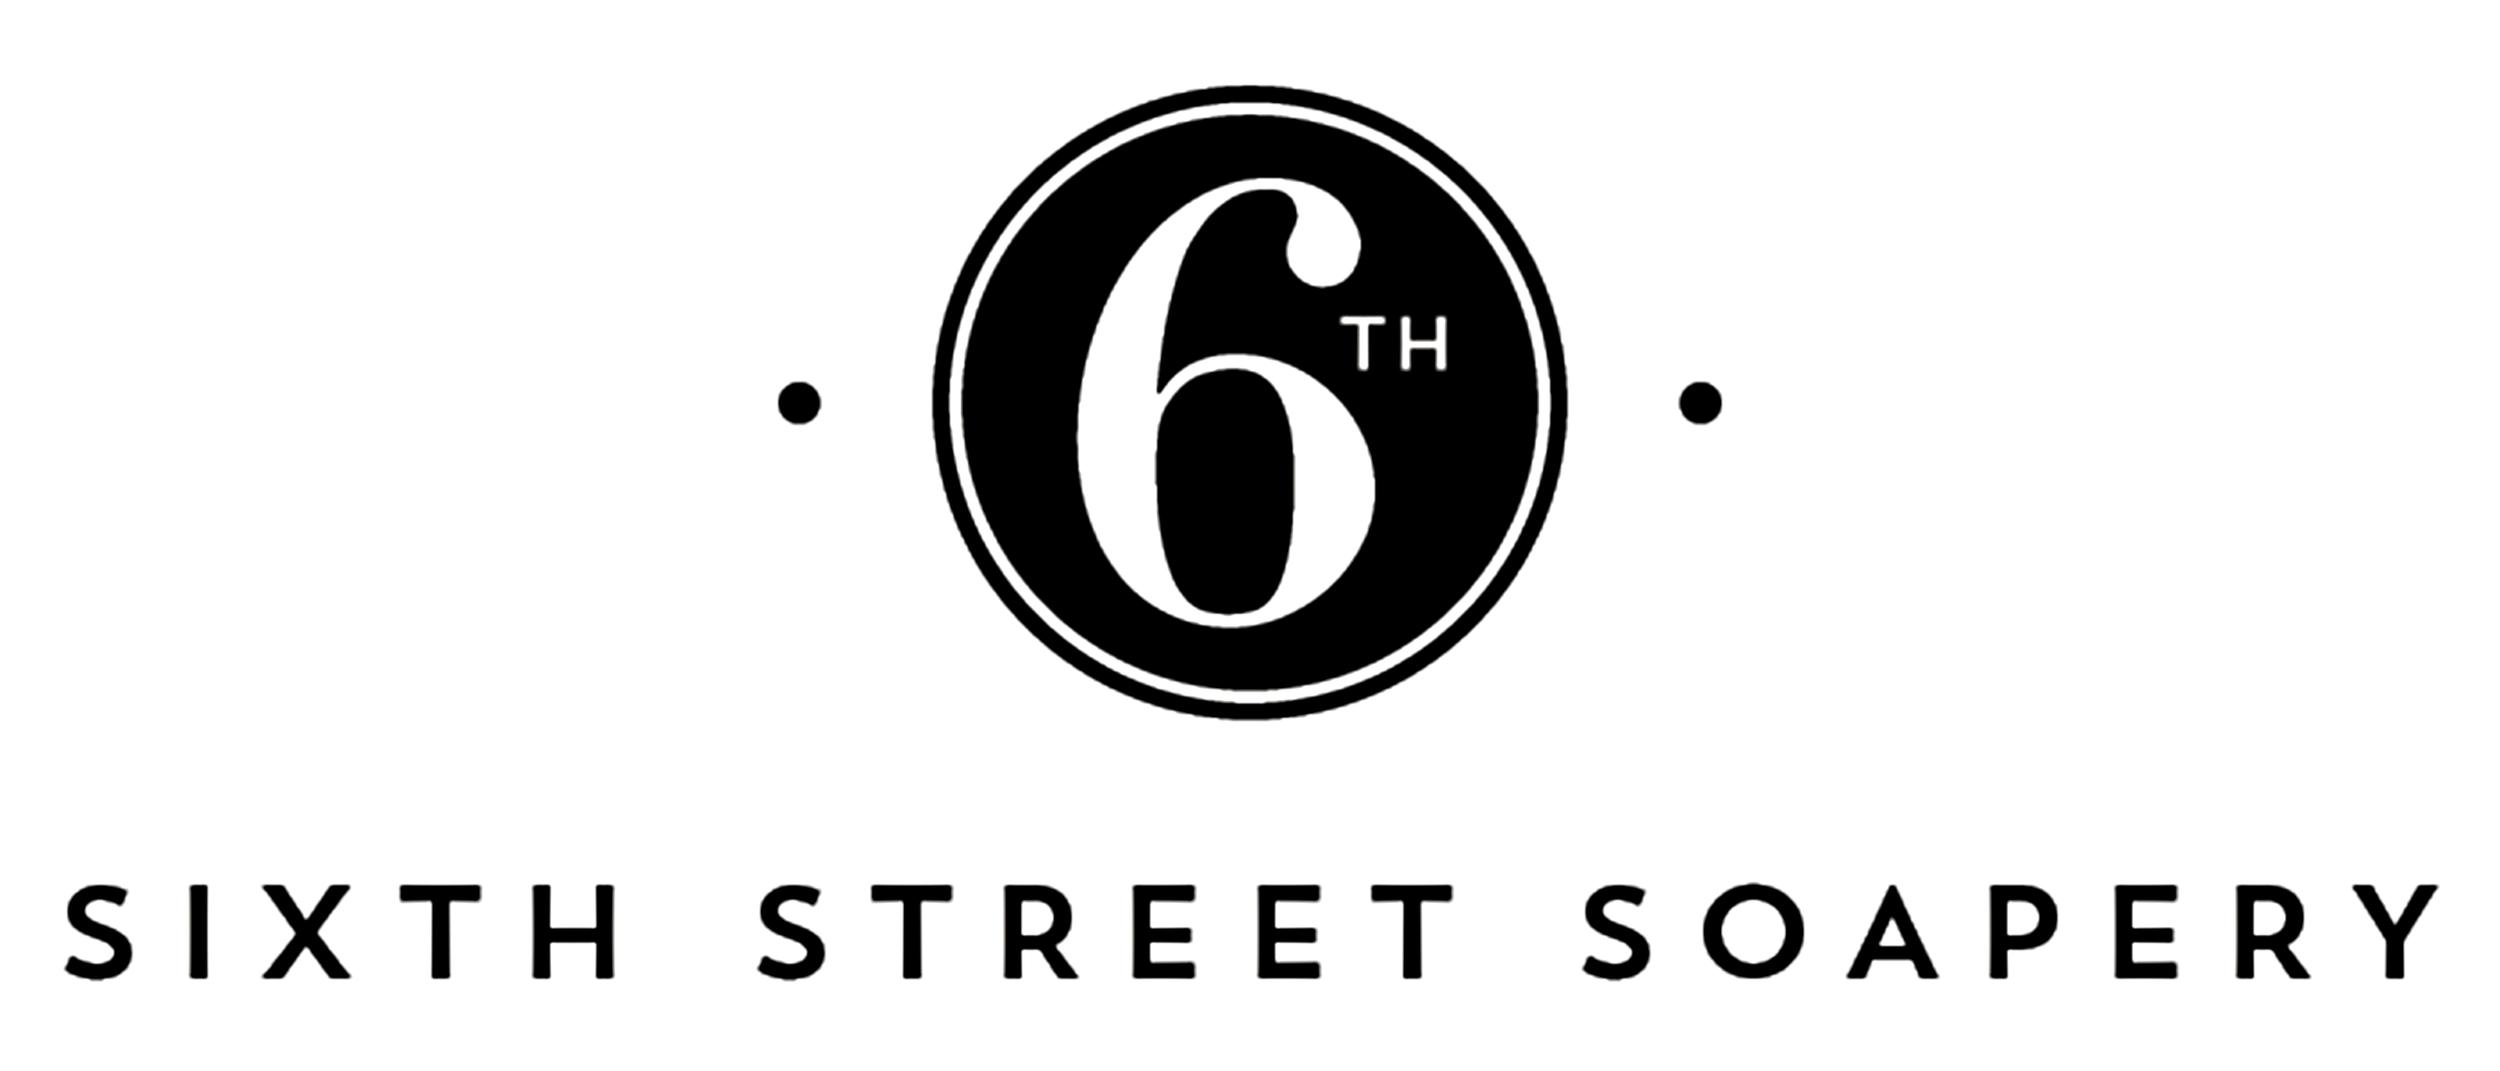 6ss-logo-white.png